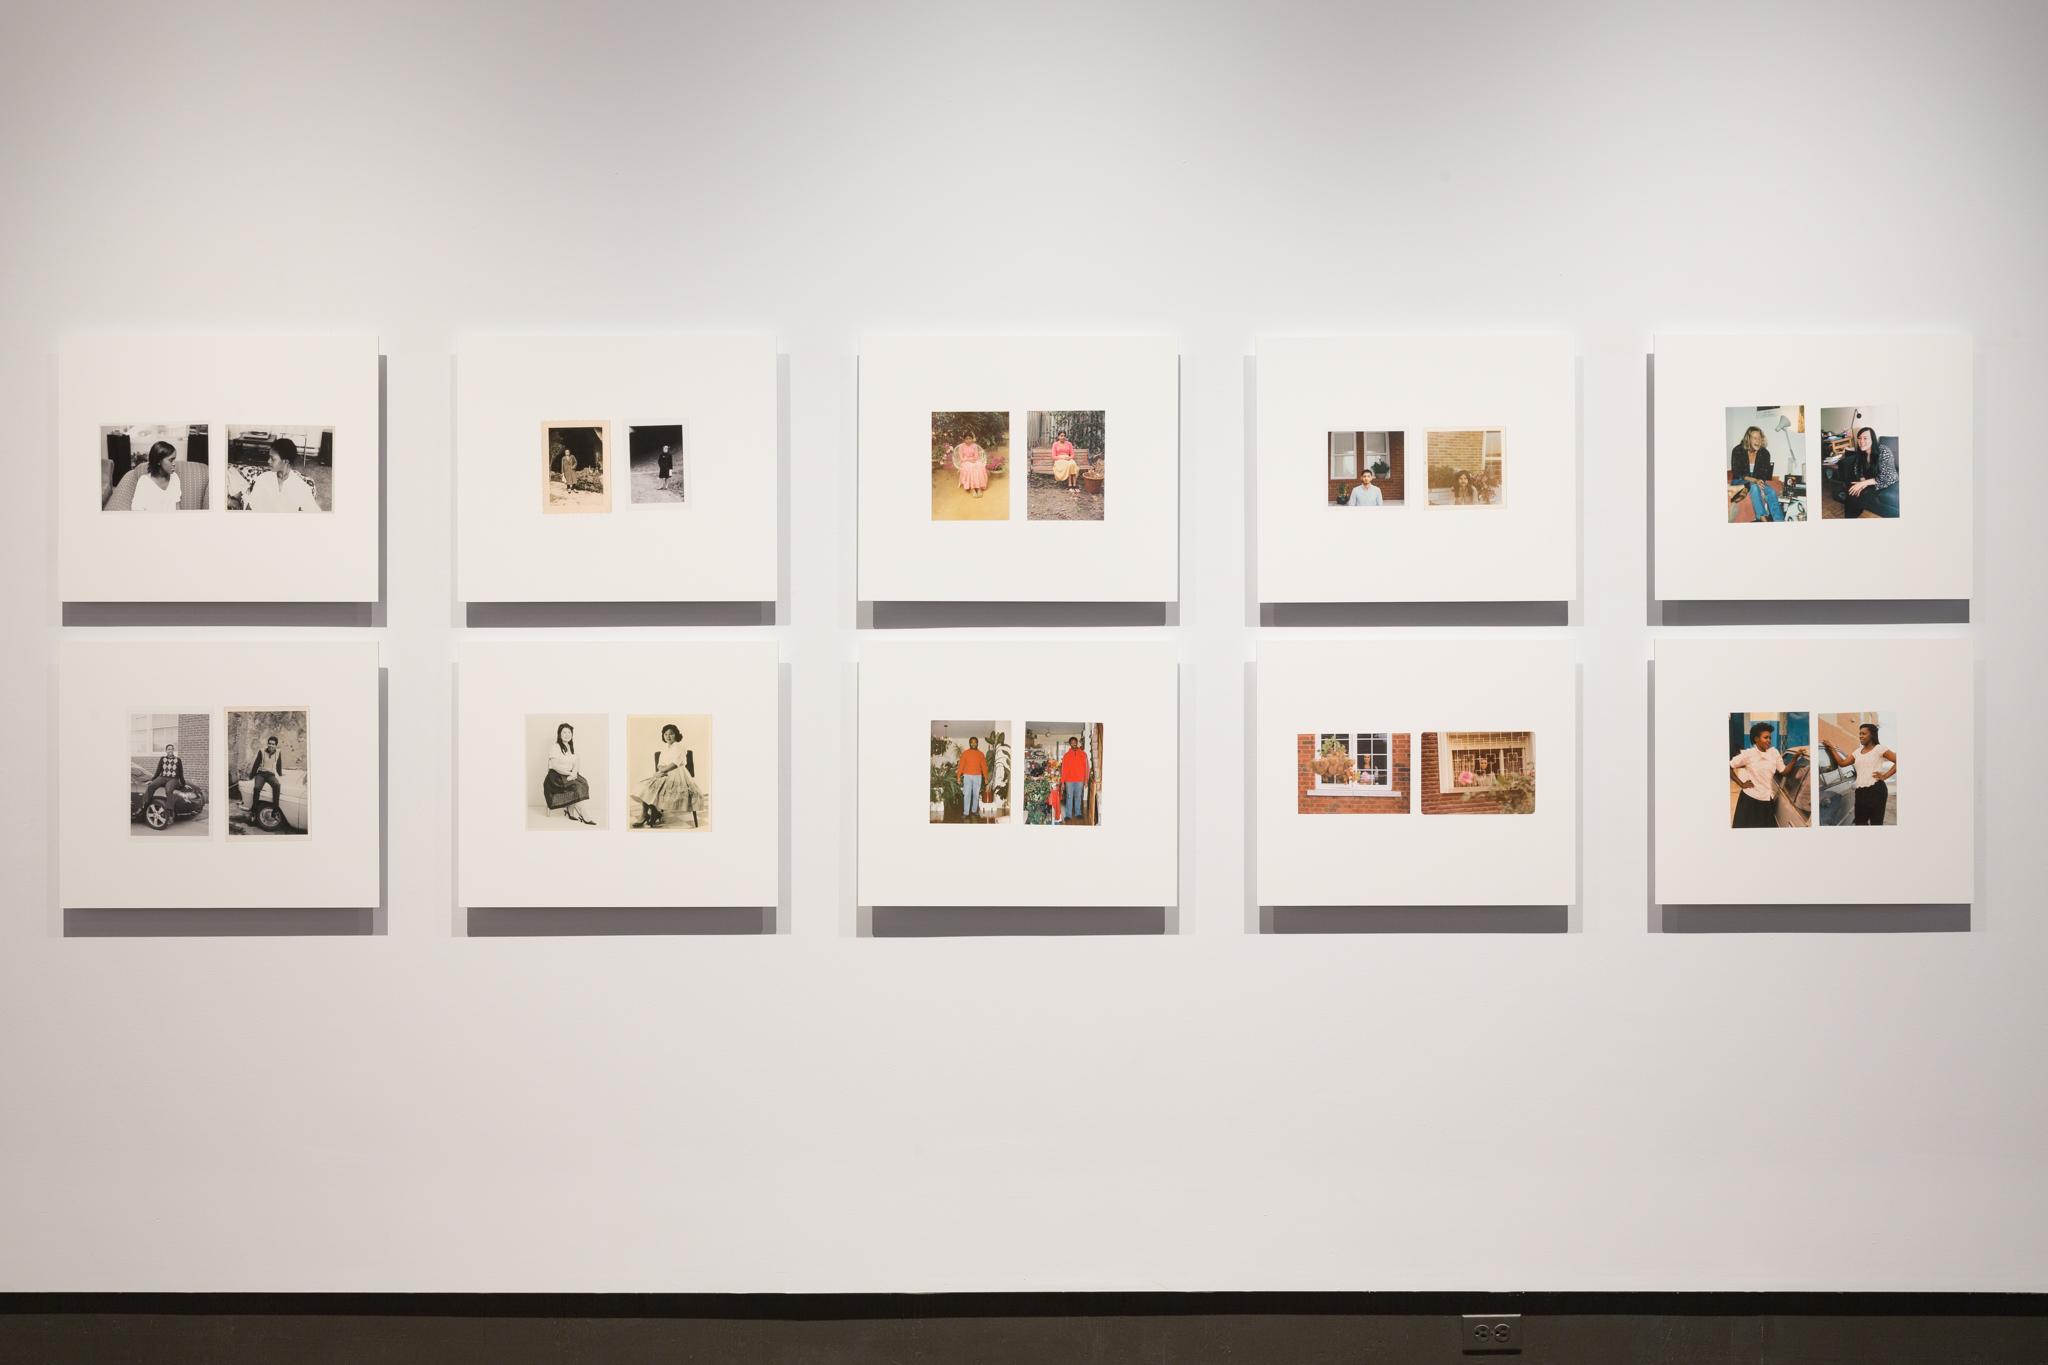 Yonder - University of Waterloo Art Gallery Waterloo. Curated by Matthew Brower and Mona Filip